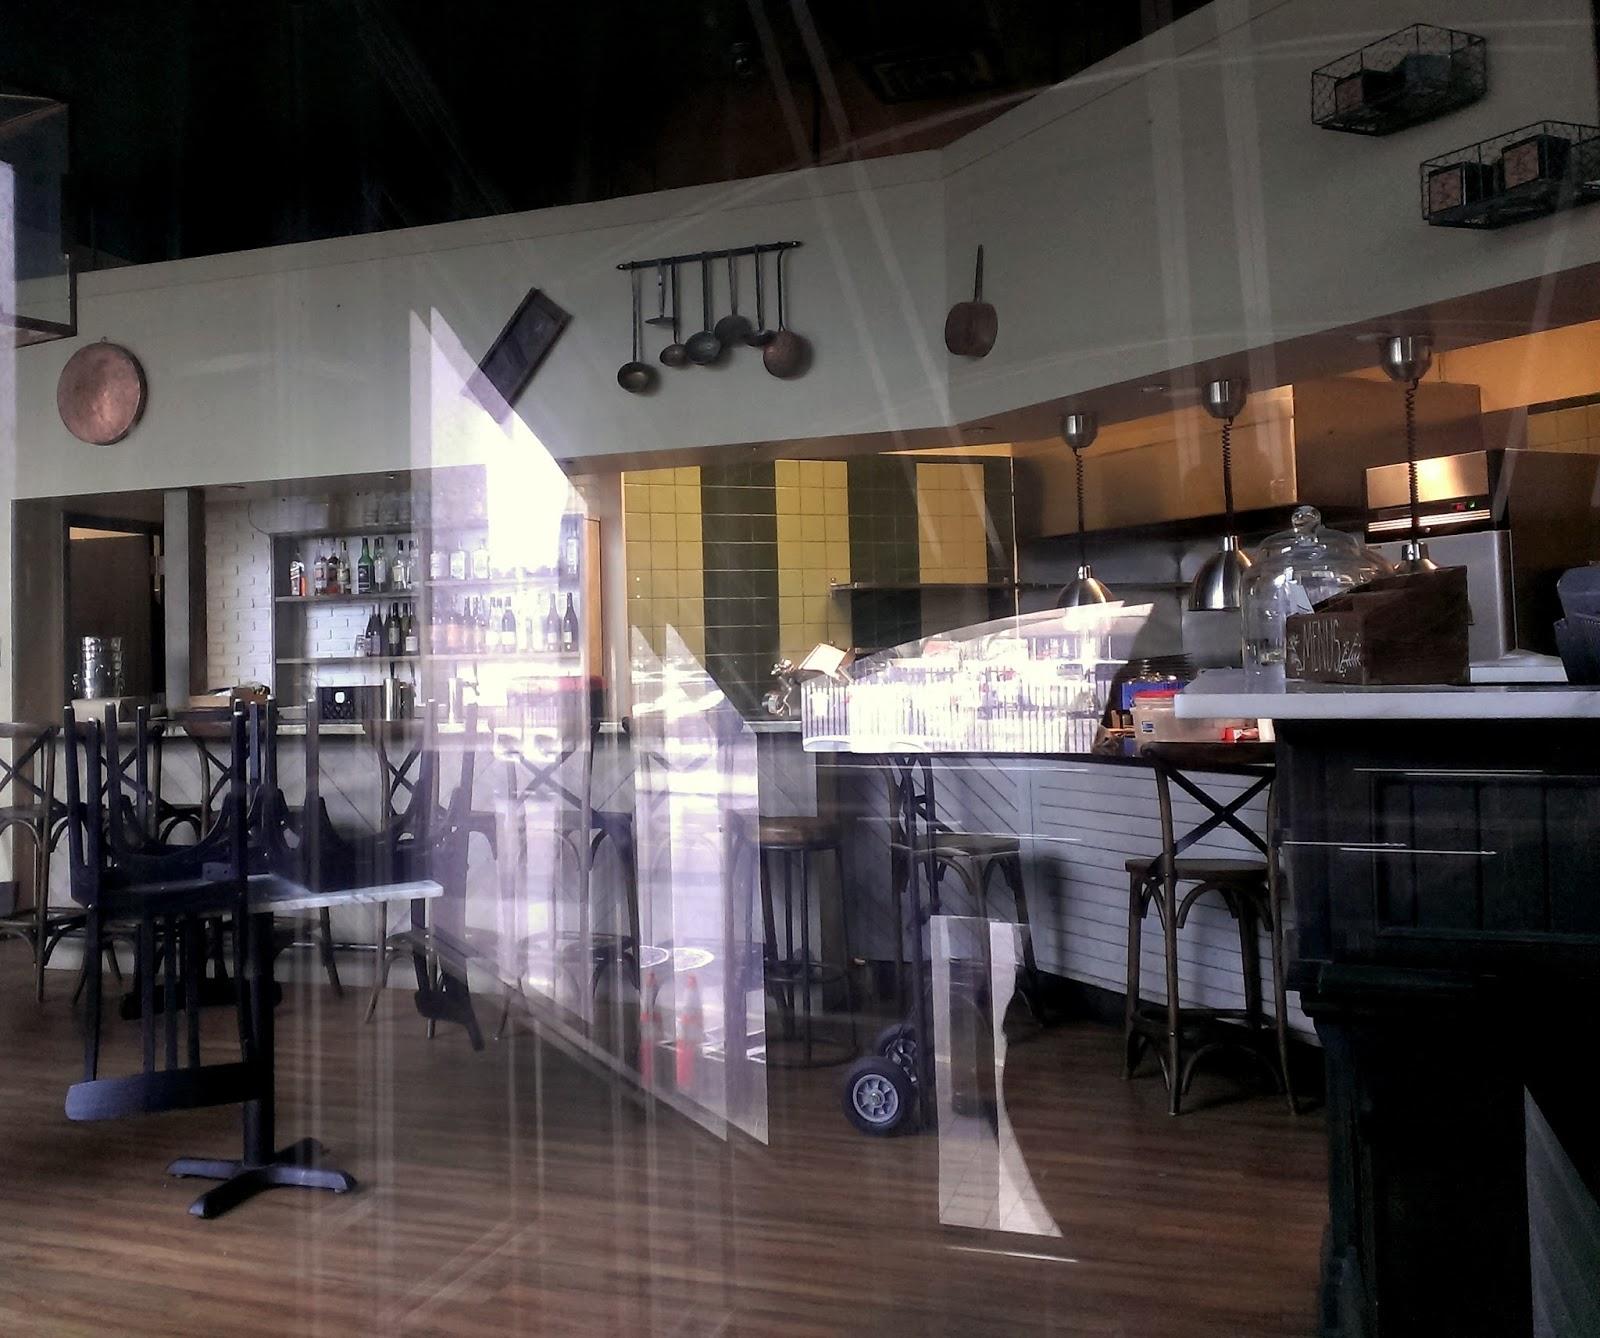 Jersey City Eats Closing Rumors Surround Talde Jc The Kitchen At